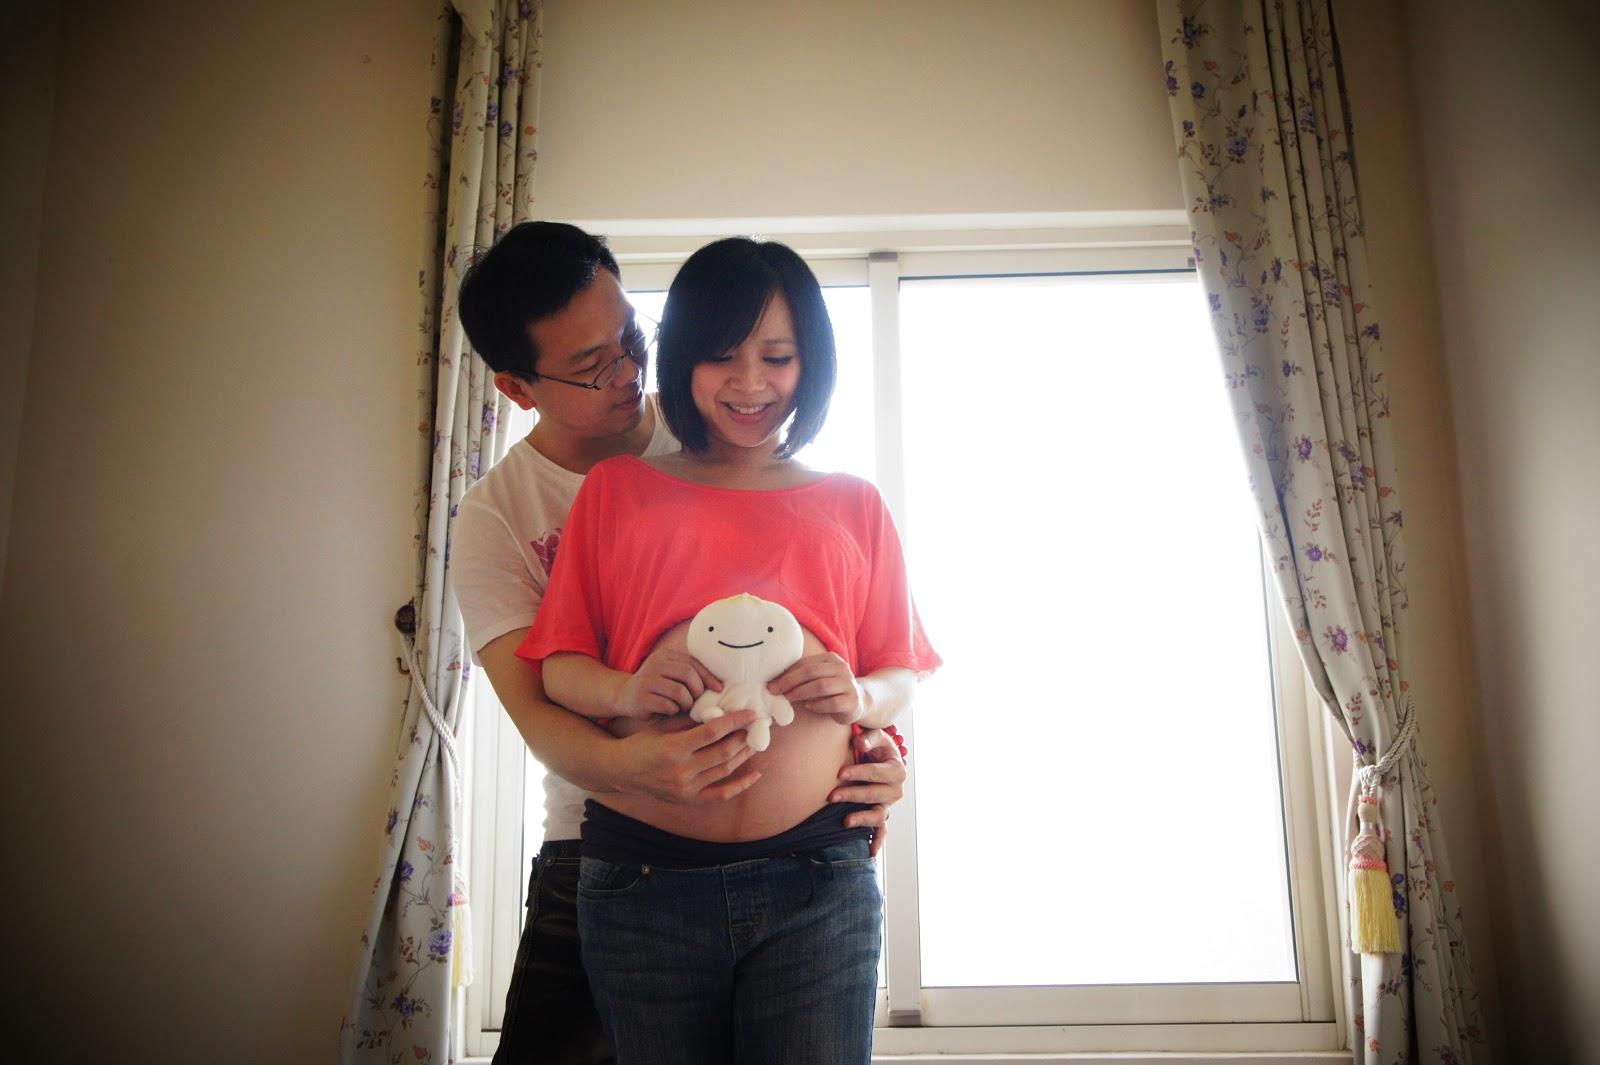 7.DSC05693.JPG-懷孕,紀錄屬於妳的勇敢與美